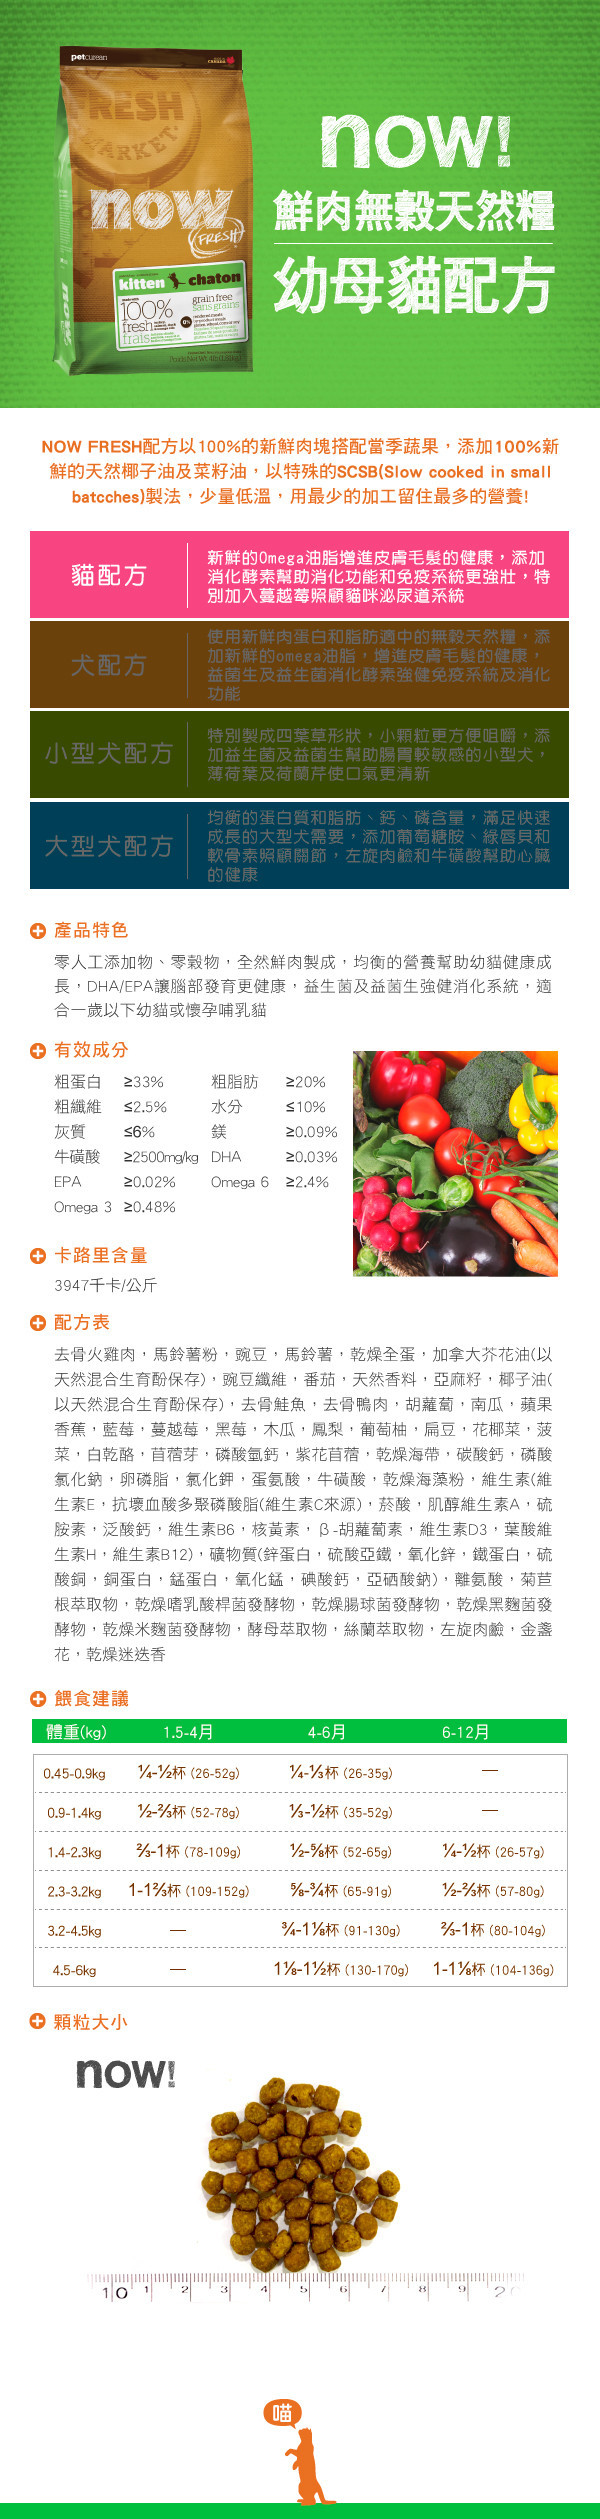 815260003742Now(貓)鮮肉無穀幼貓配方4lb圖片來源:東購